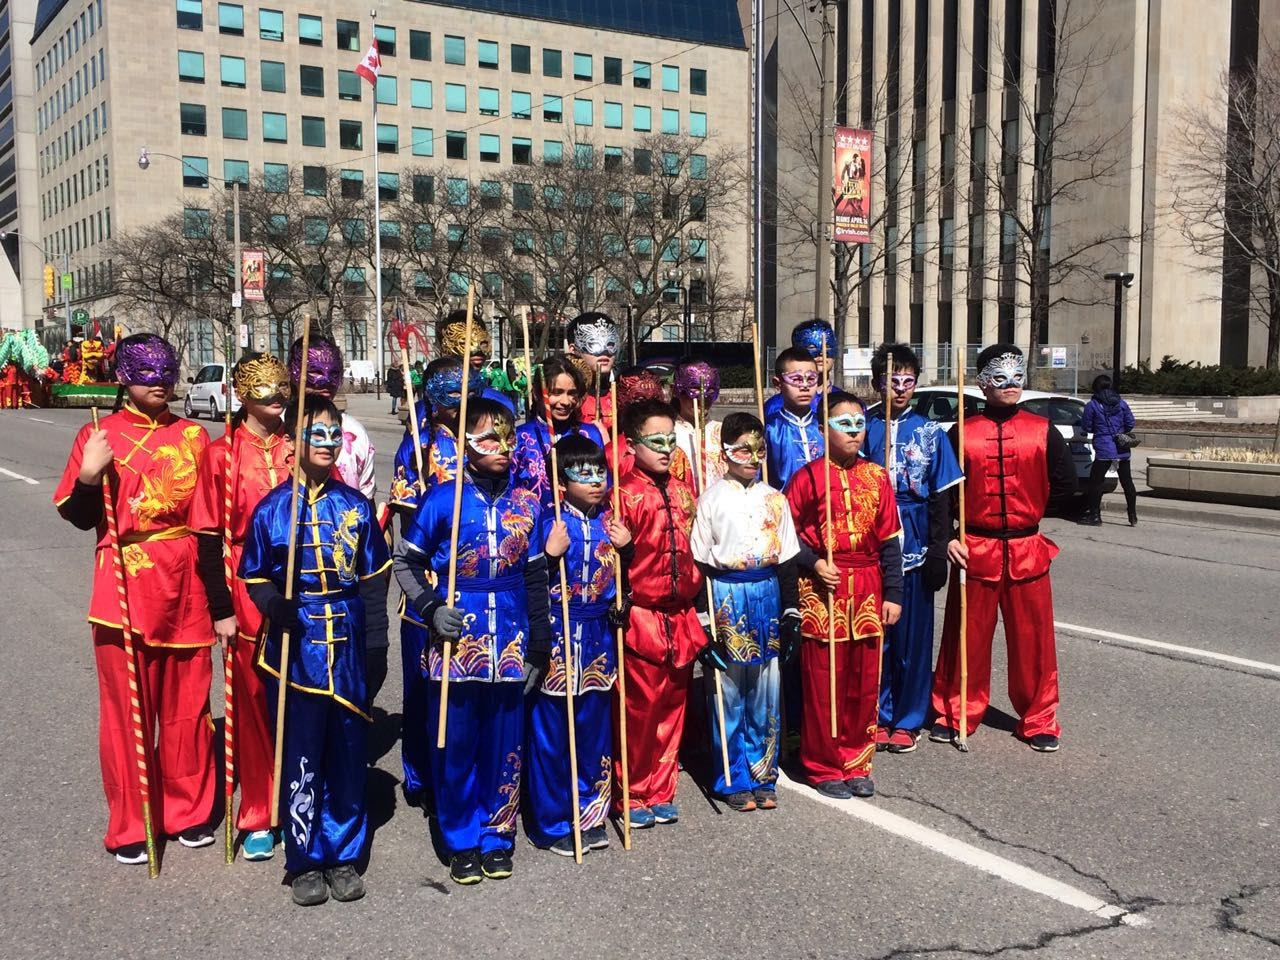 wayland-li-wushu-toronto-st-patricks-day-parade-2017-5.JPG